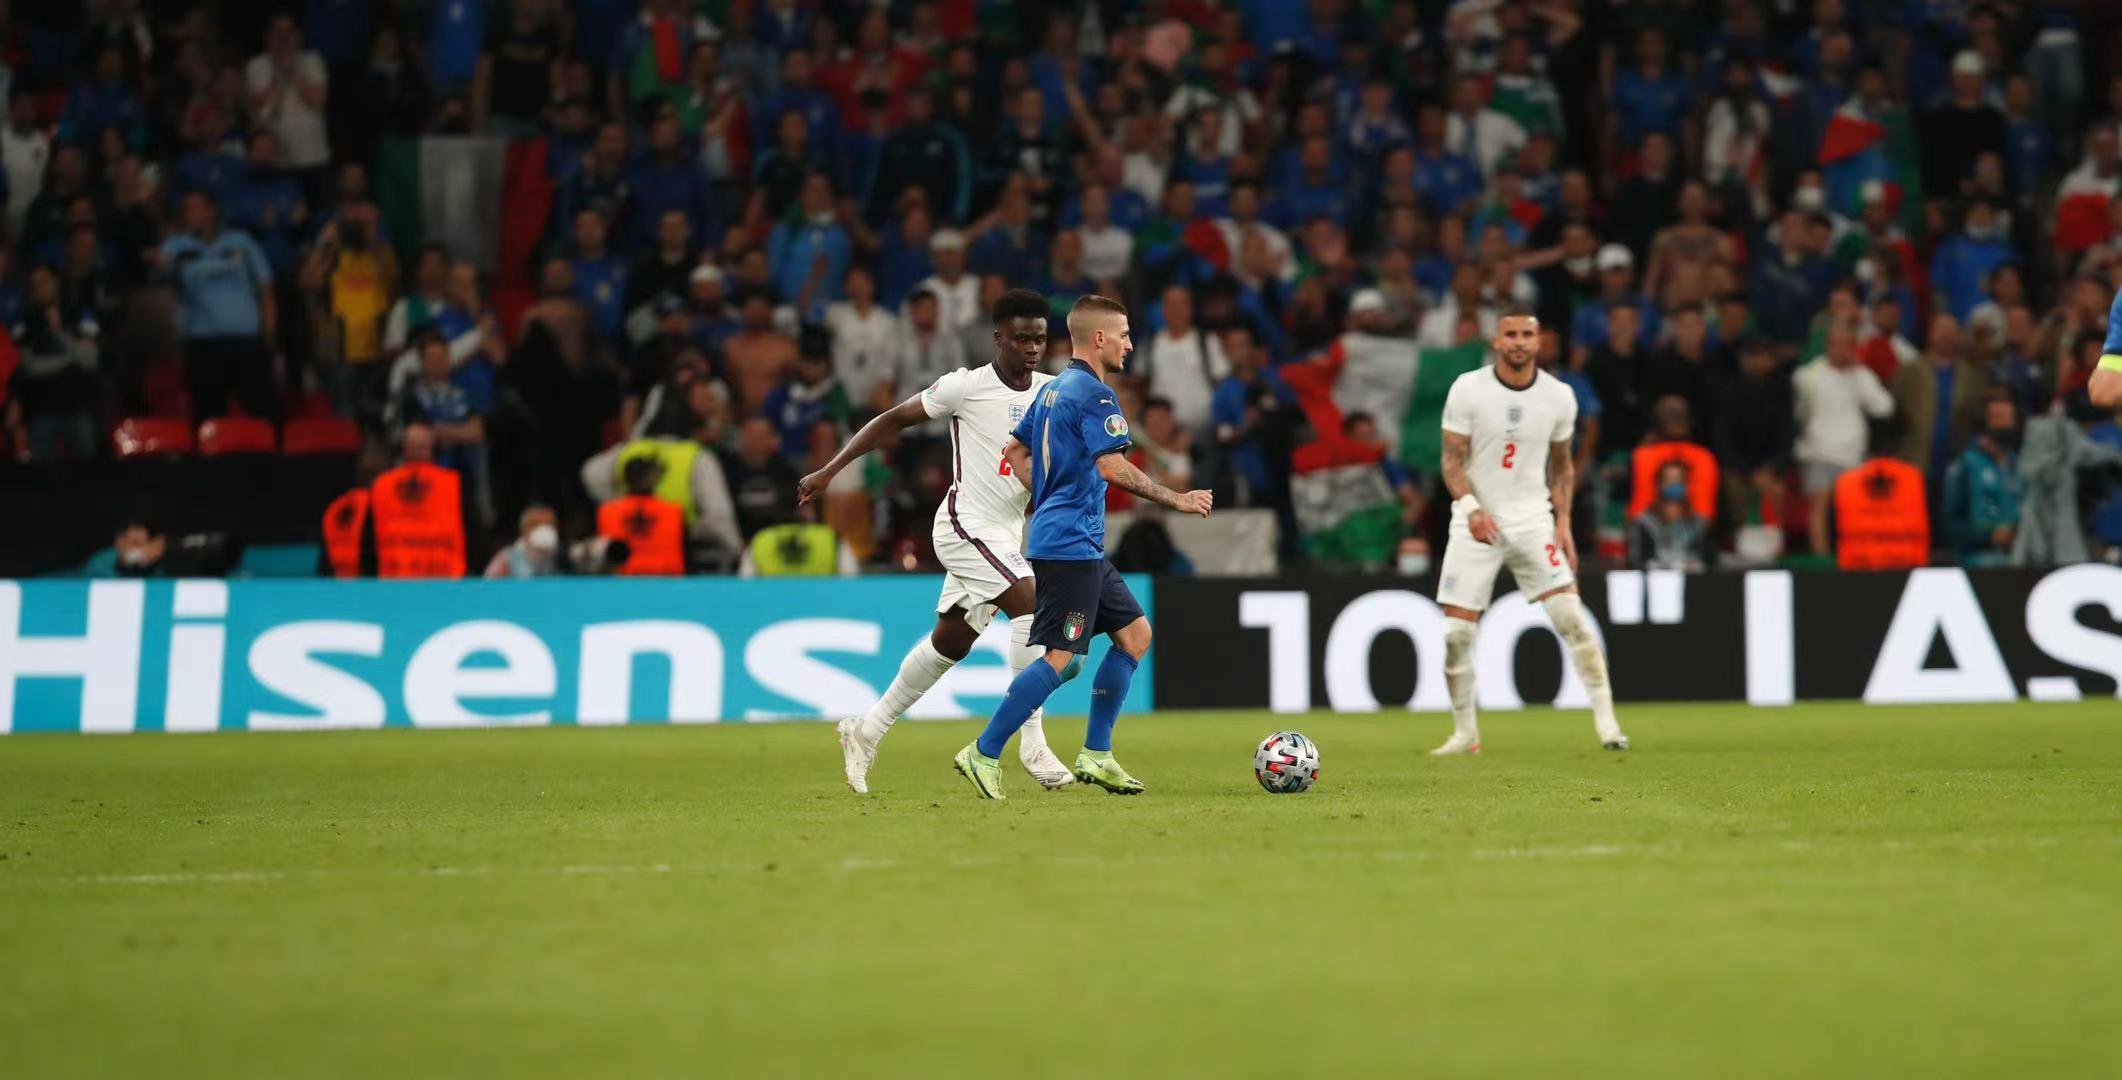 Chinese brands shine at Euro 2020